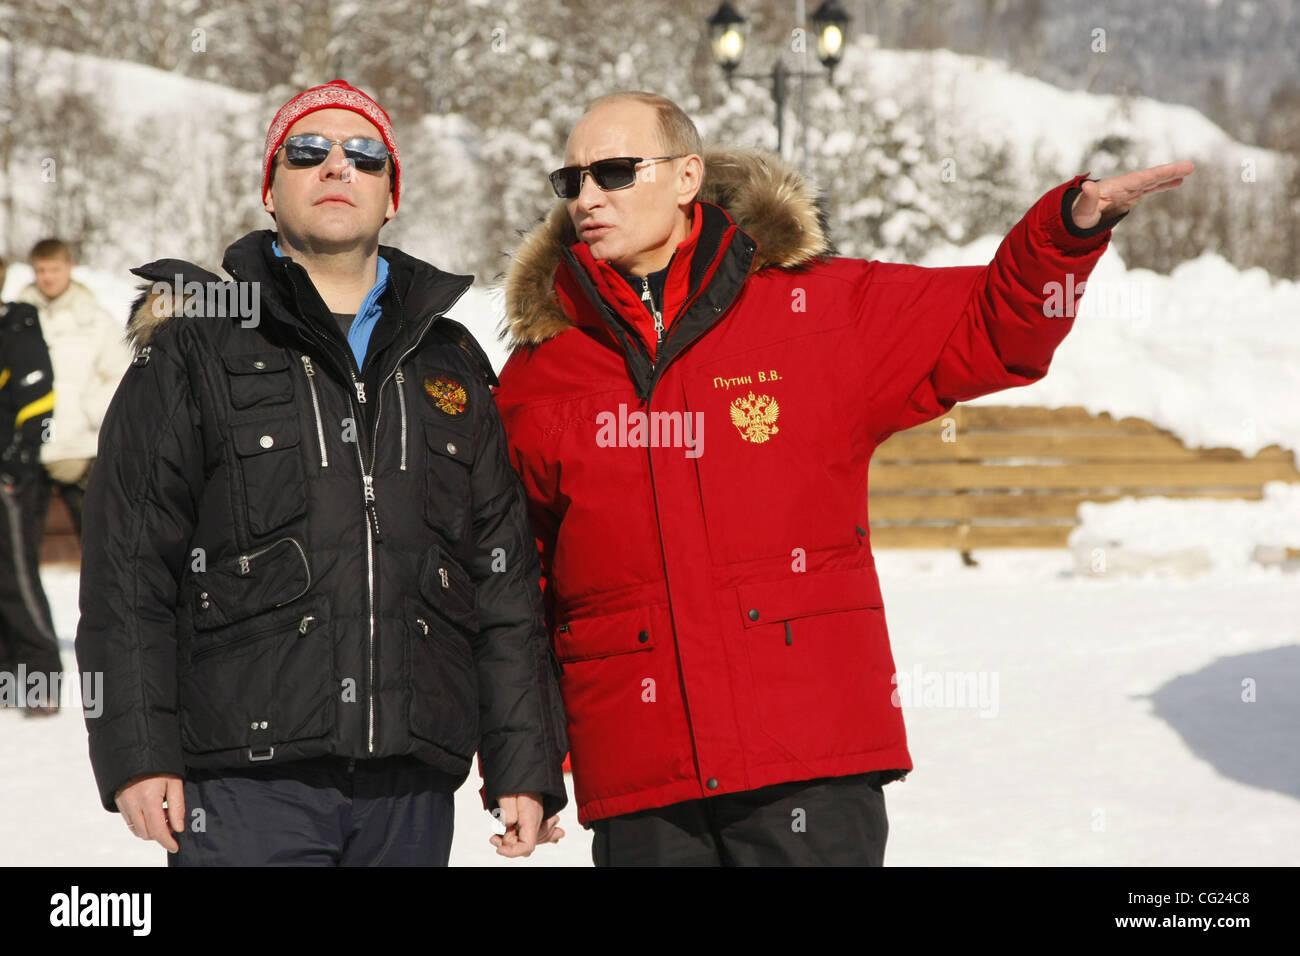 Feb 18 2011 Sochi Krasnodar Territory Russian Federation L R Stock Photo Alamy